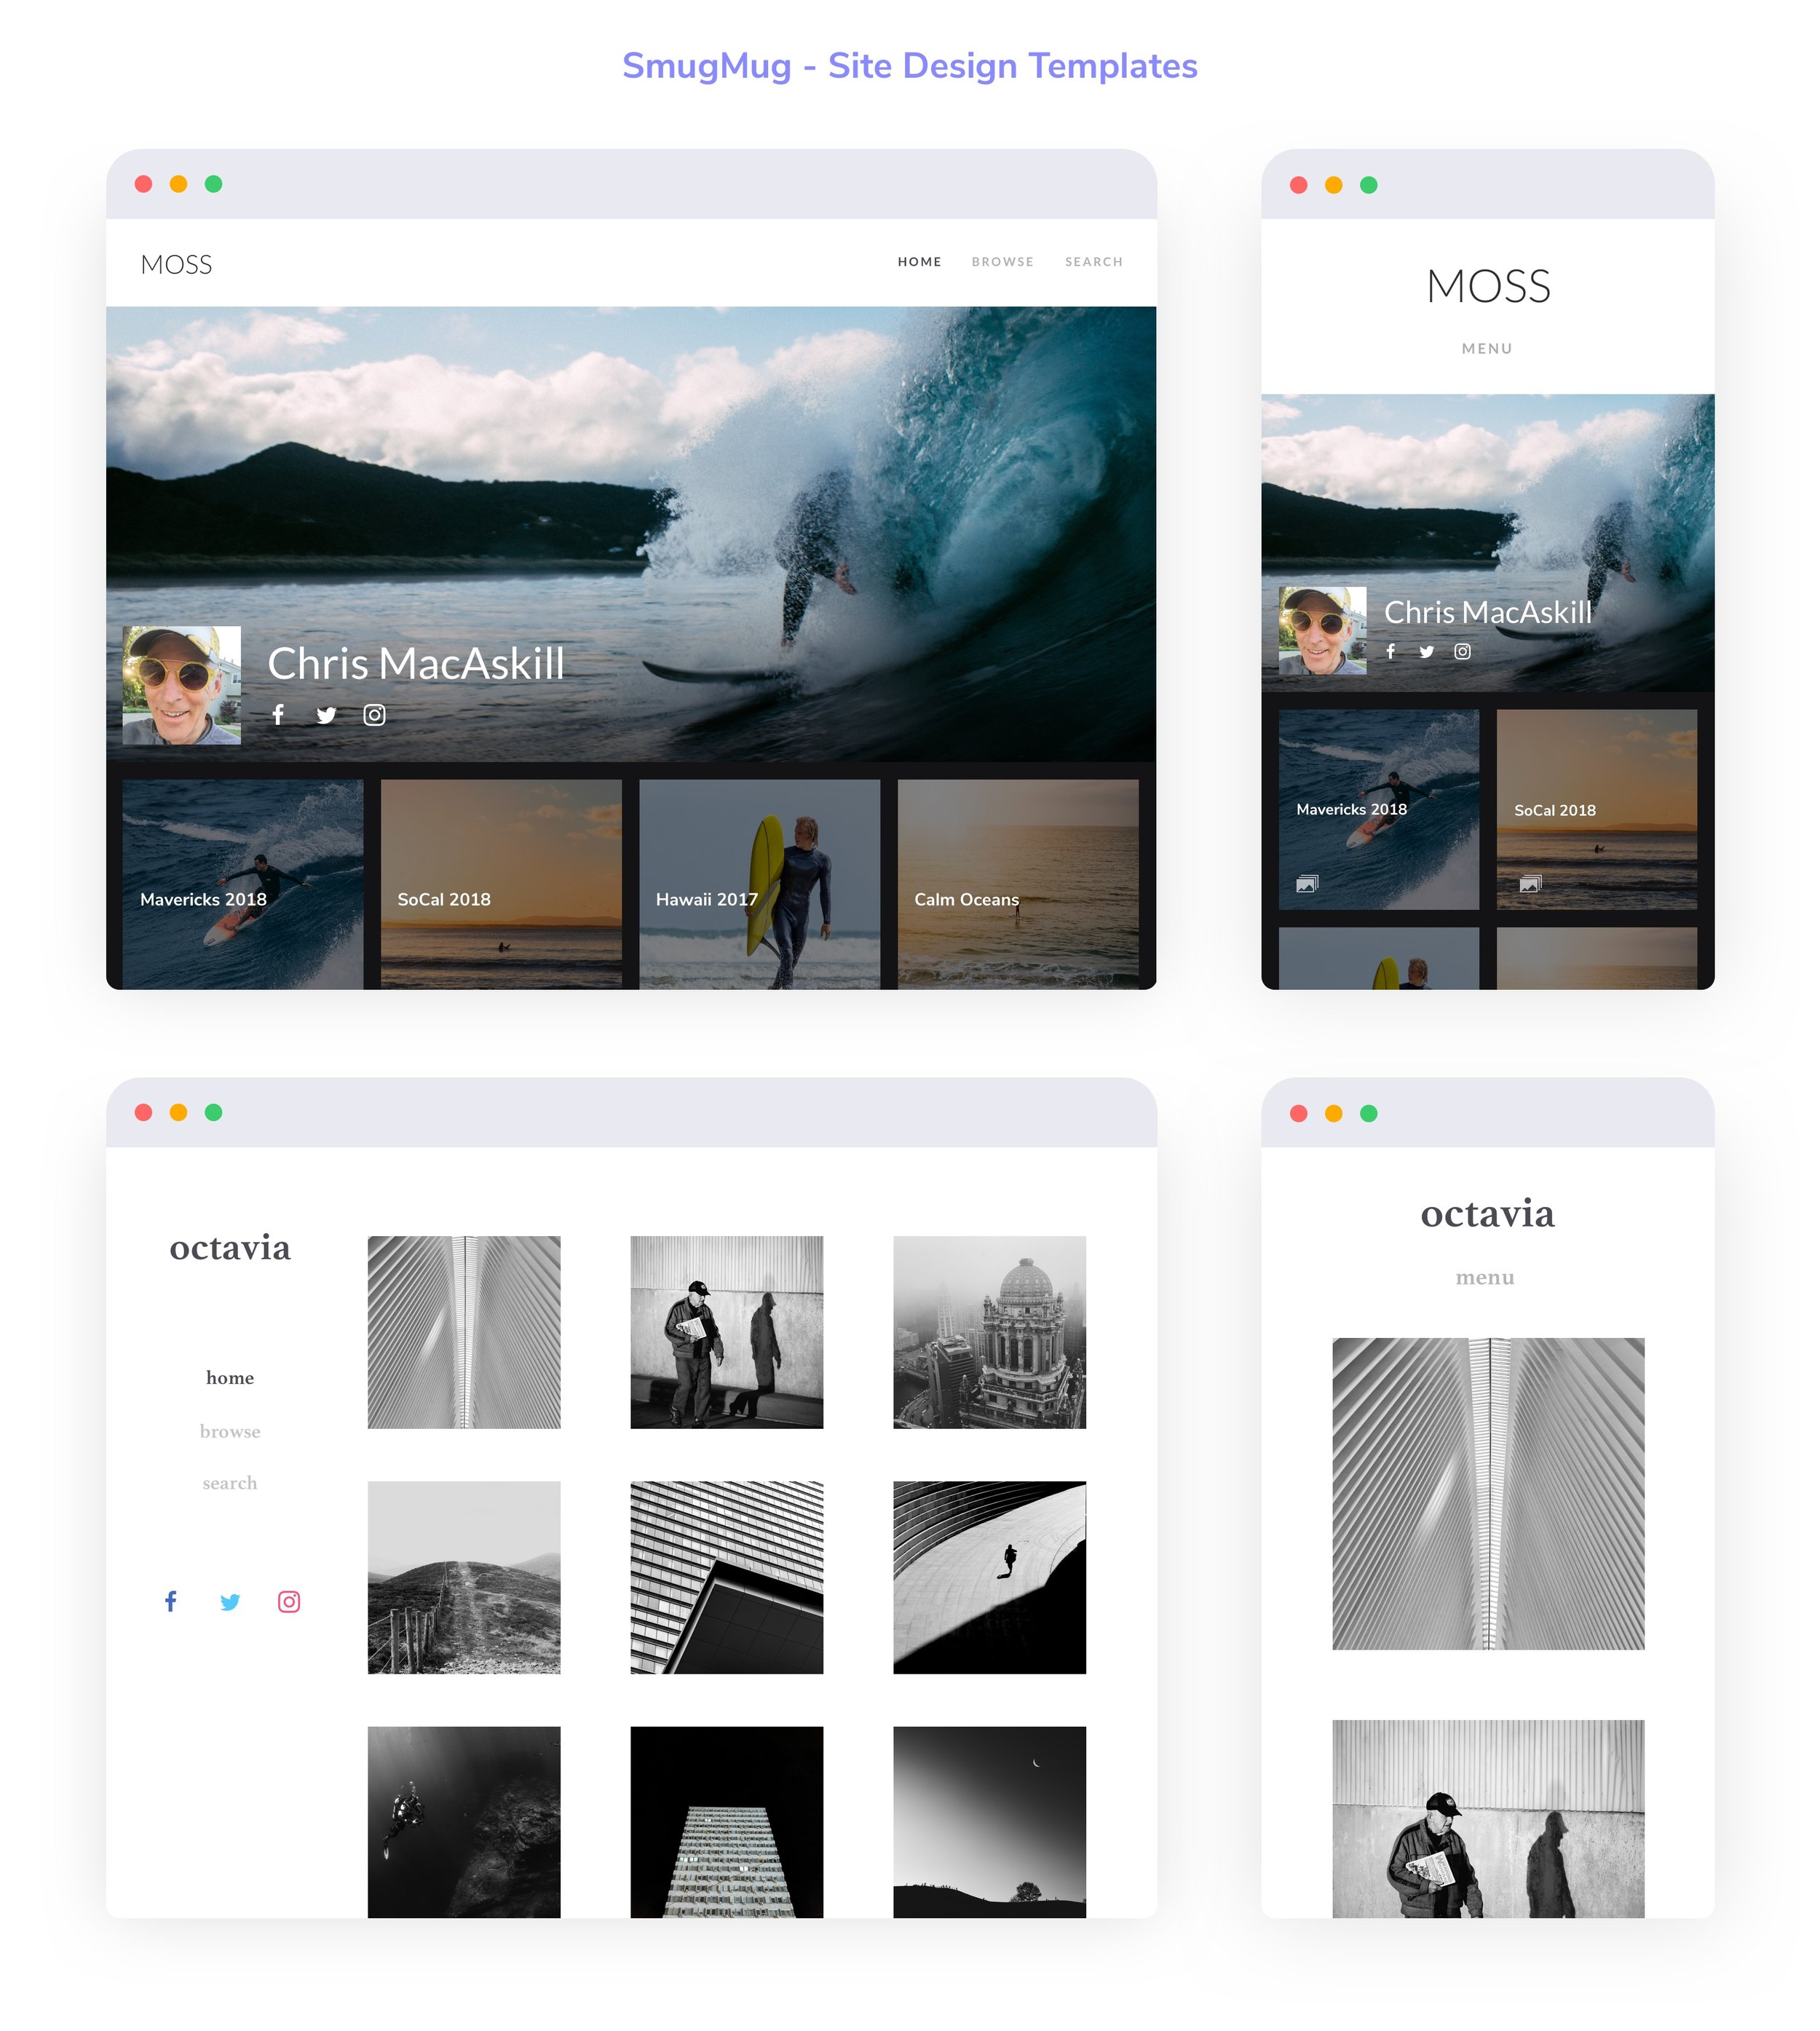 design 3 copy 2.jpg